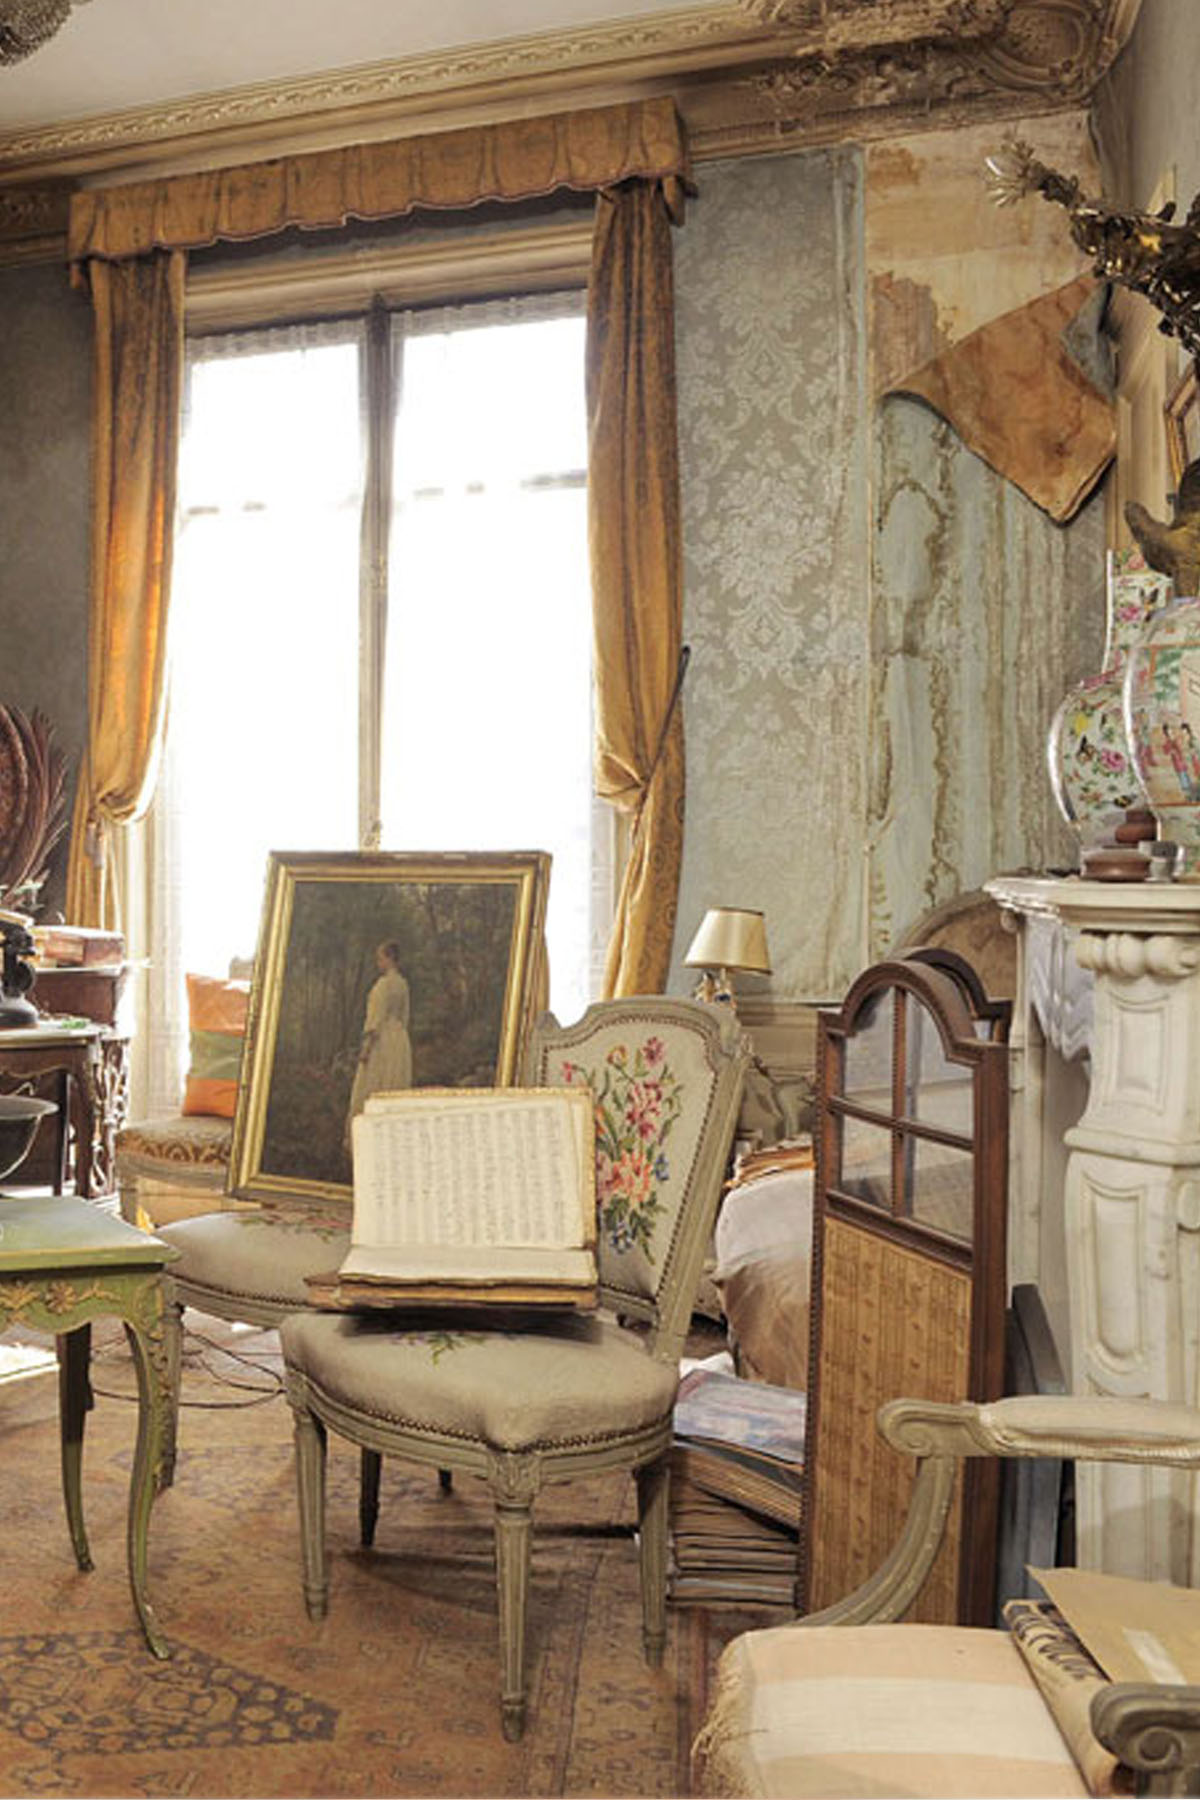 marthe_de_florian_appartement_2